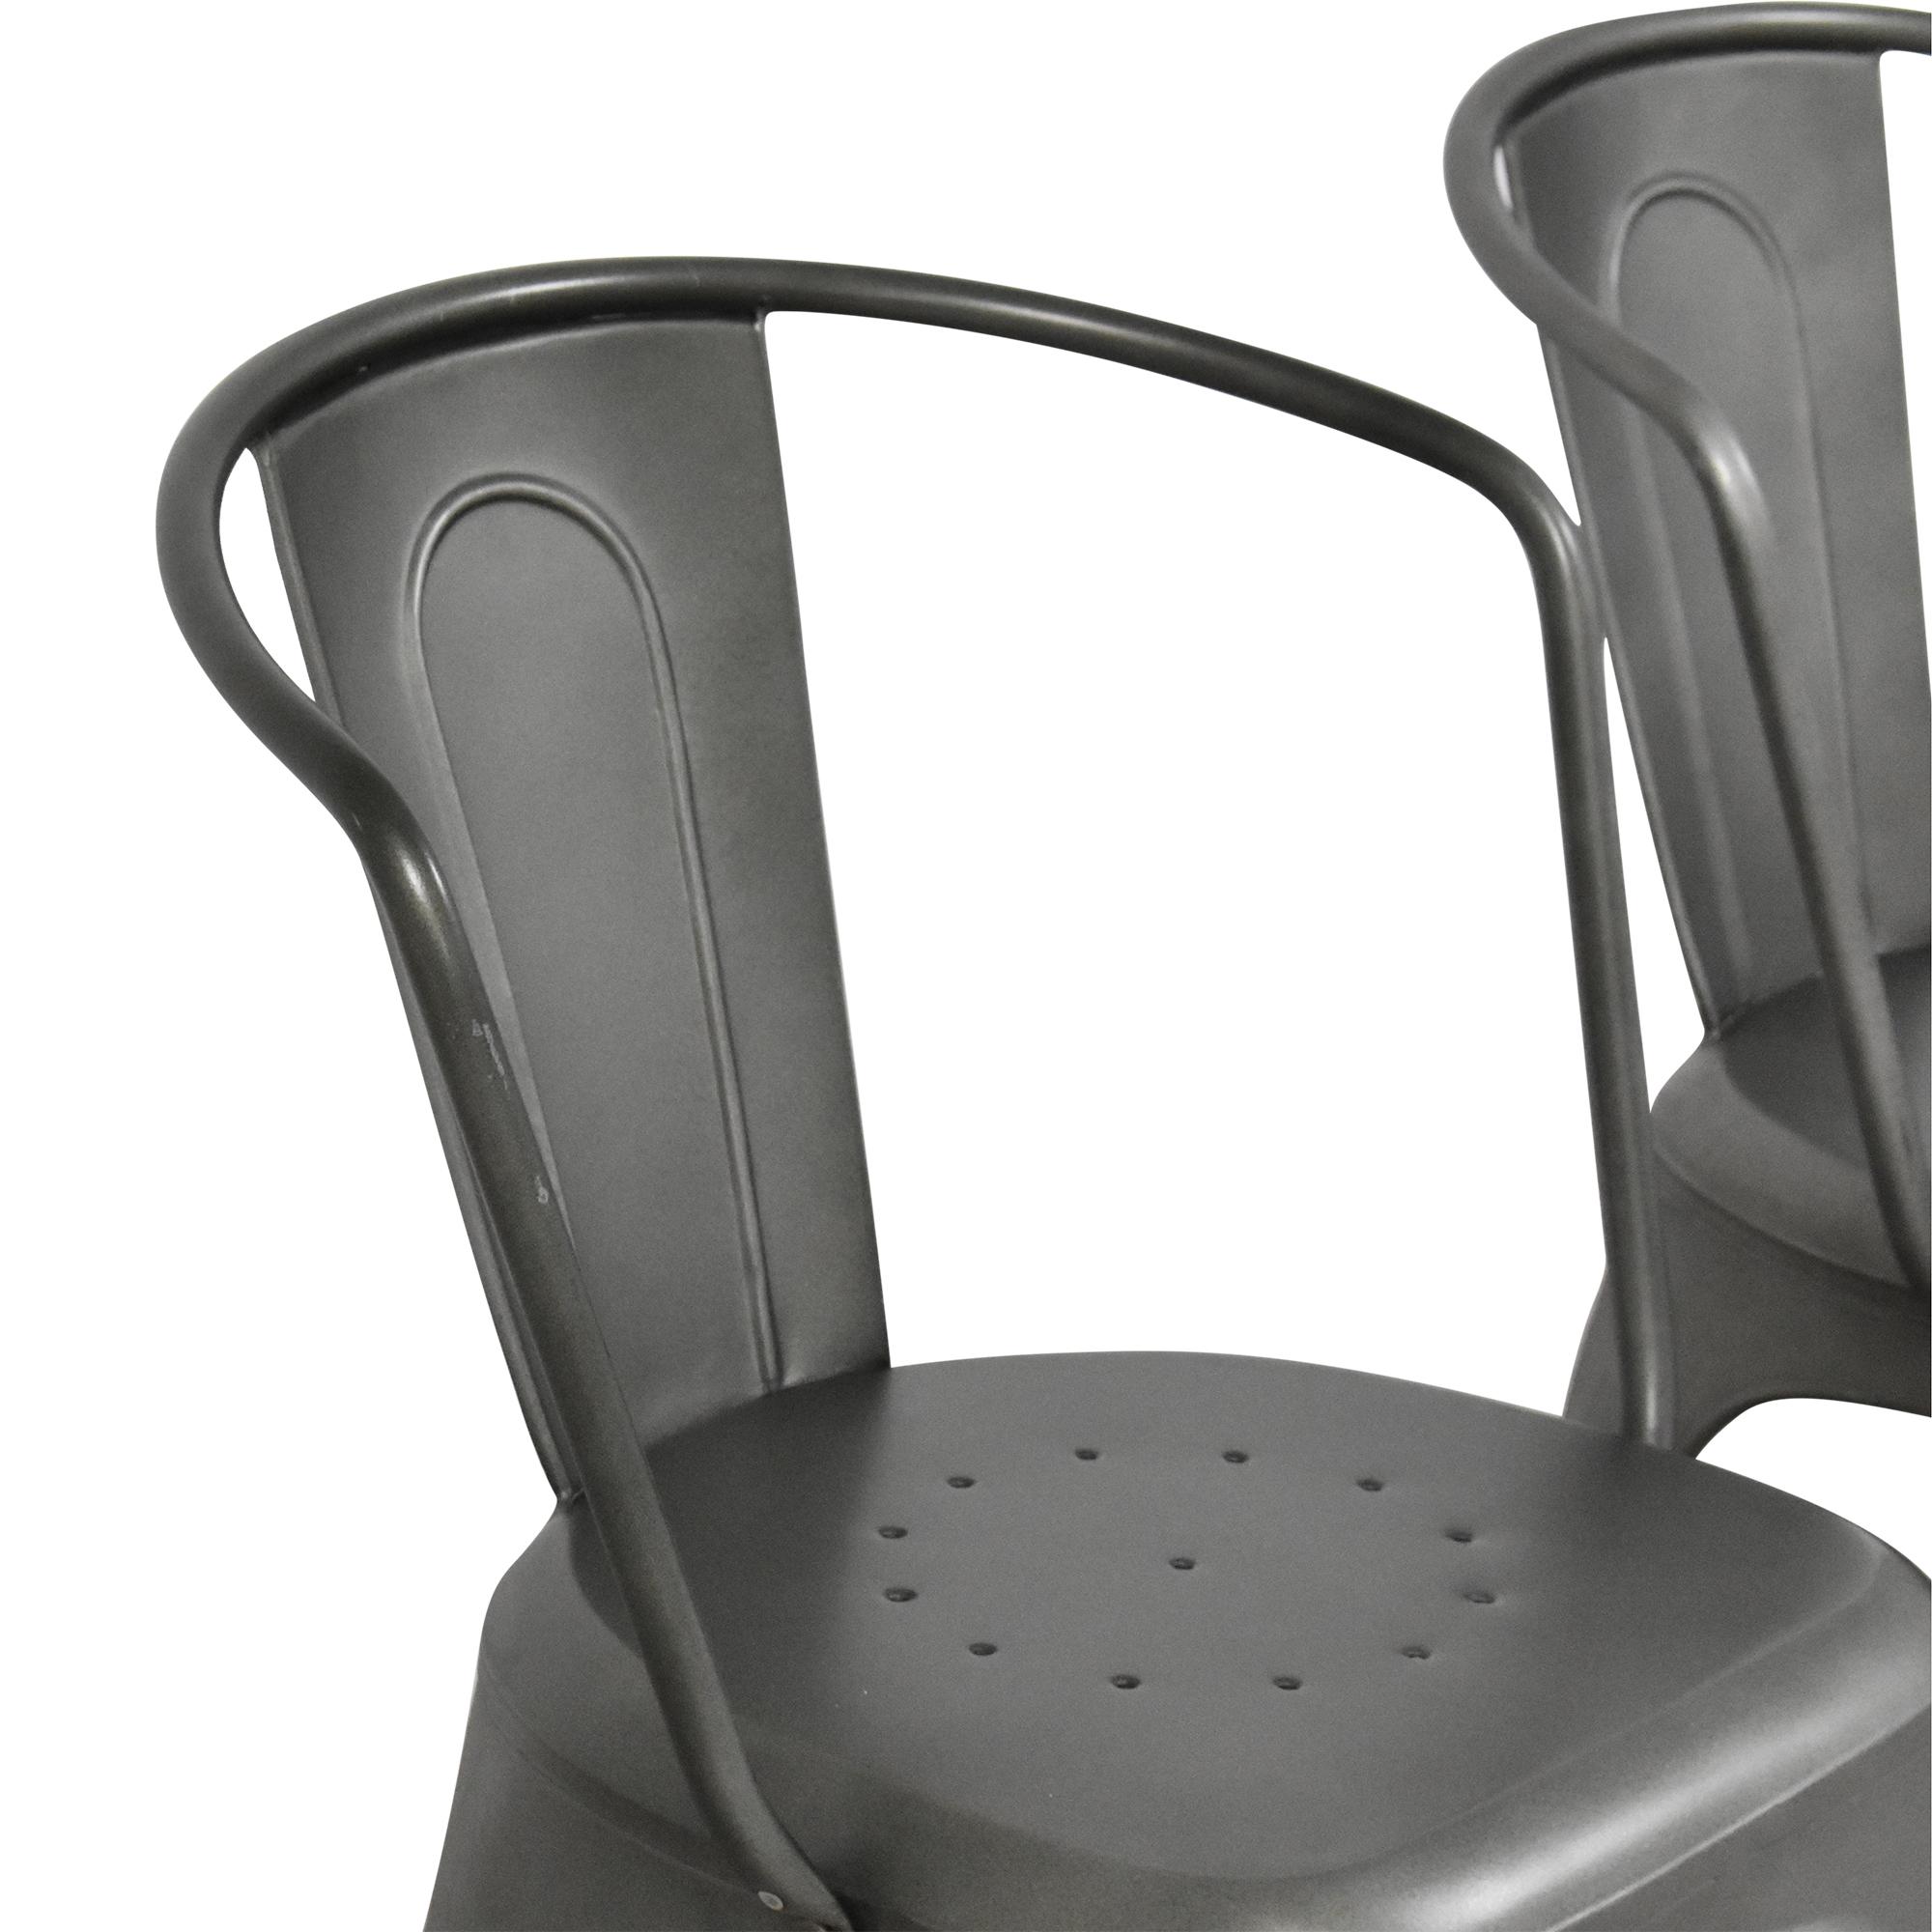 Restoration Hardware Restoration Hardware Marcel Modern Armchairs ct